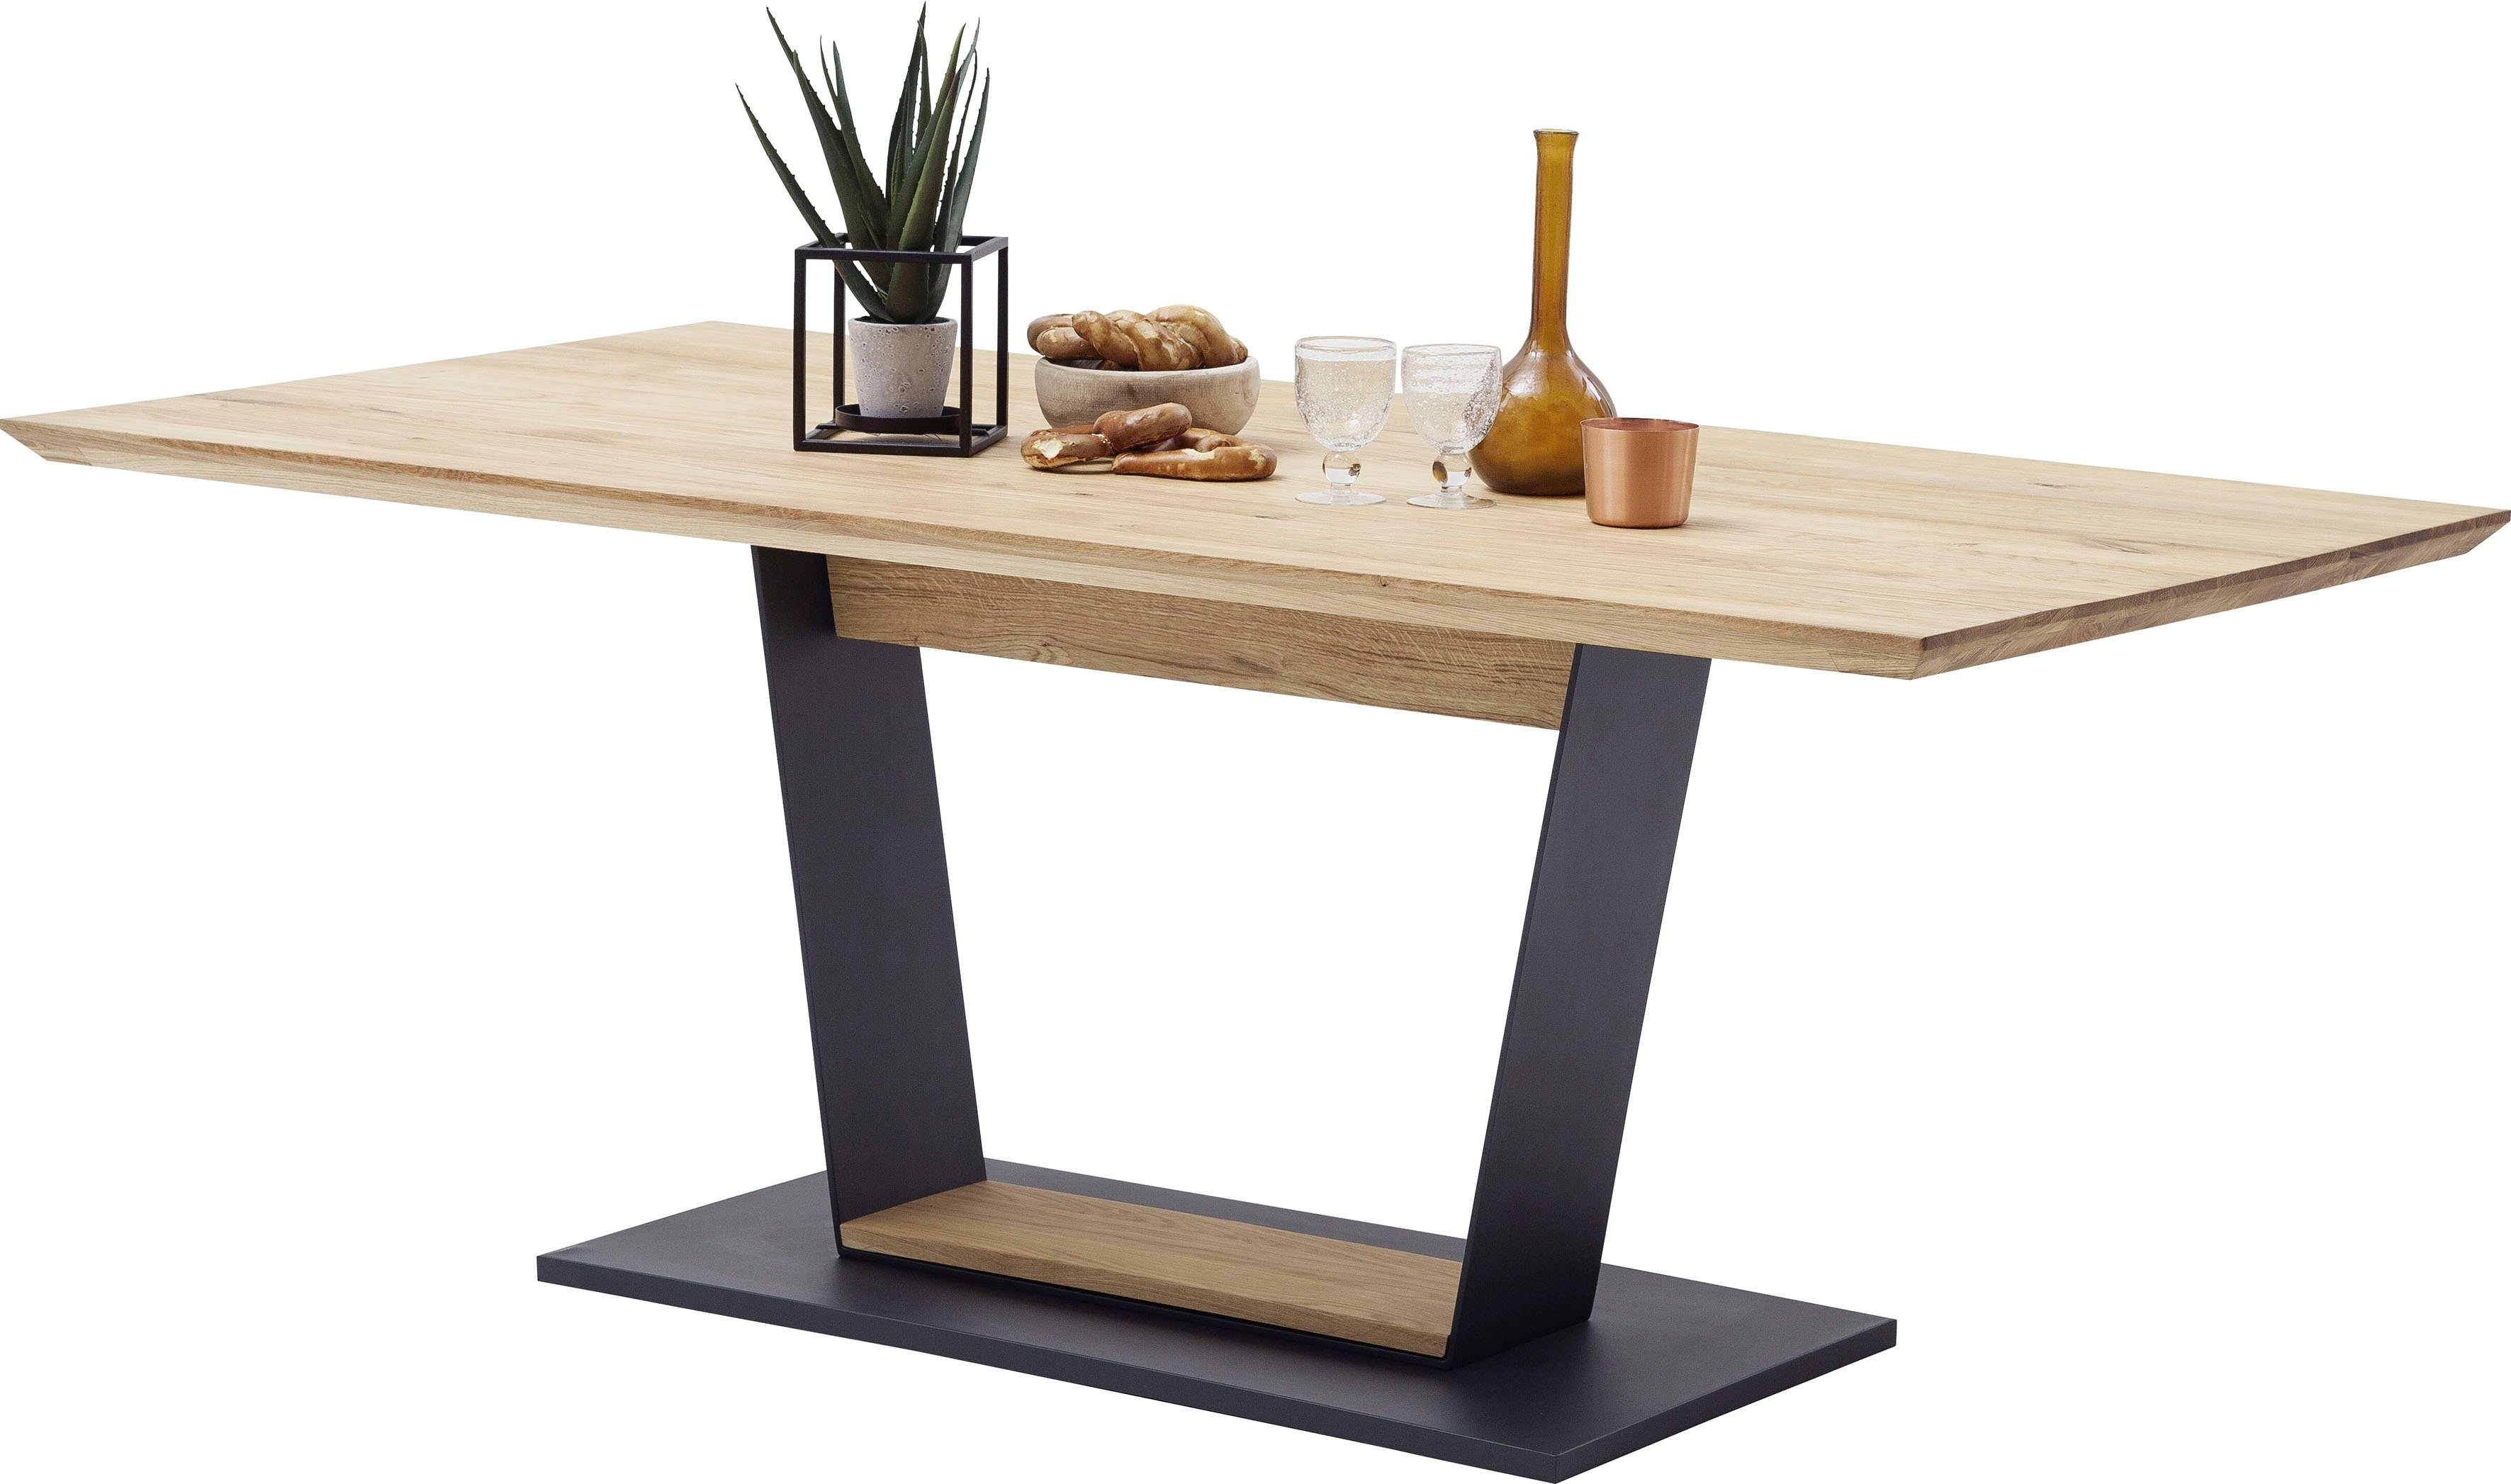 MCA furniture Eettafel Malambo Massief hout veilig op otto.nl kopen